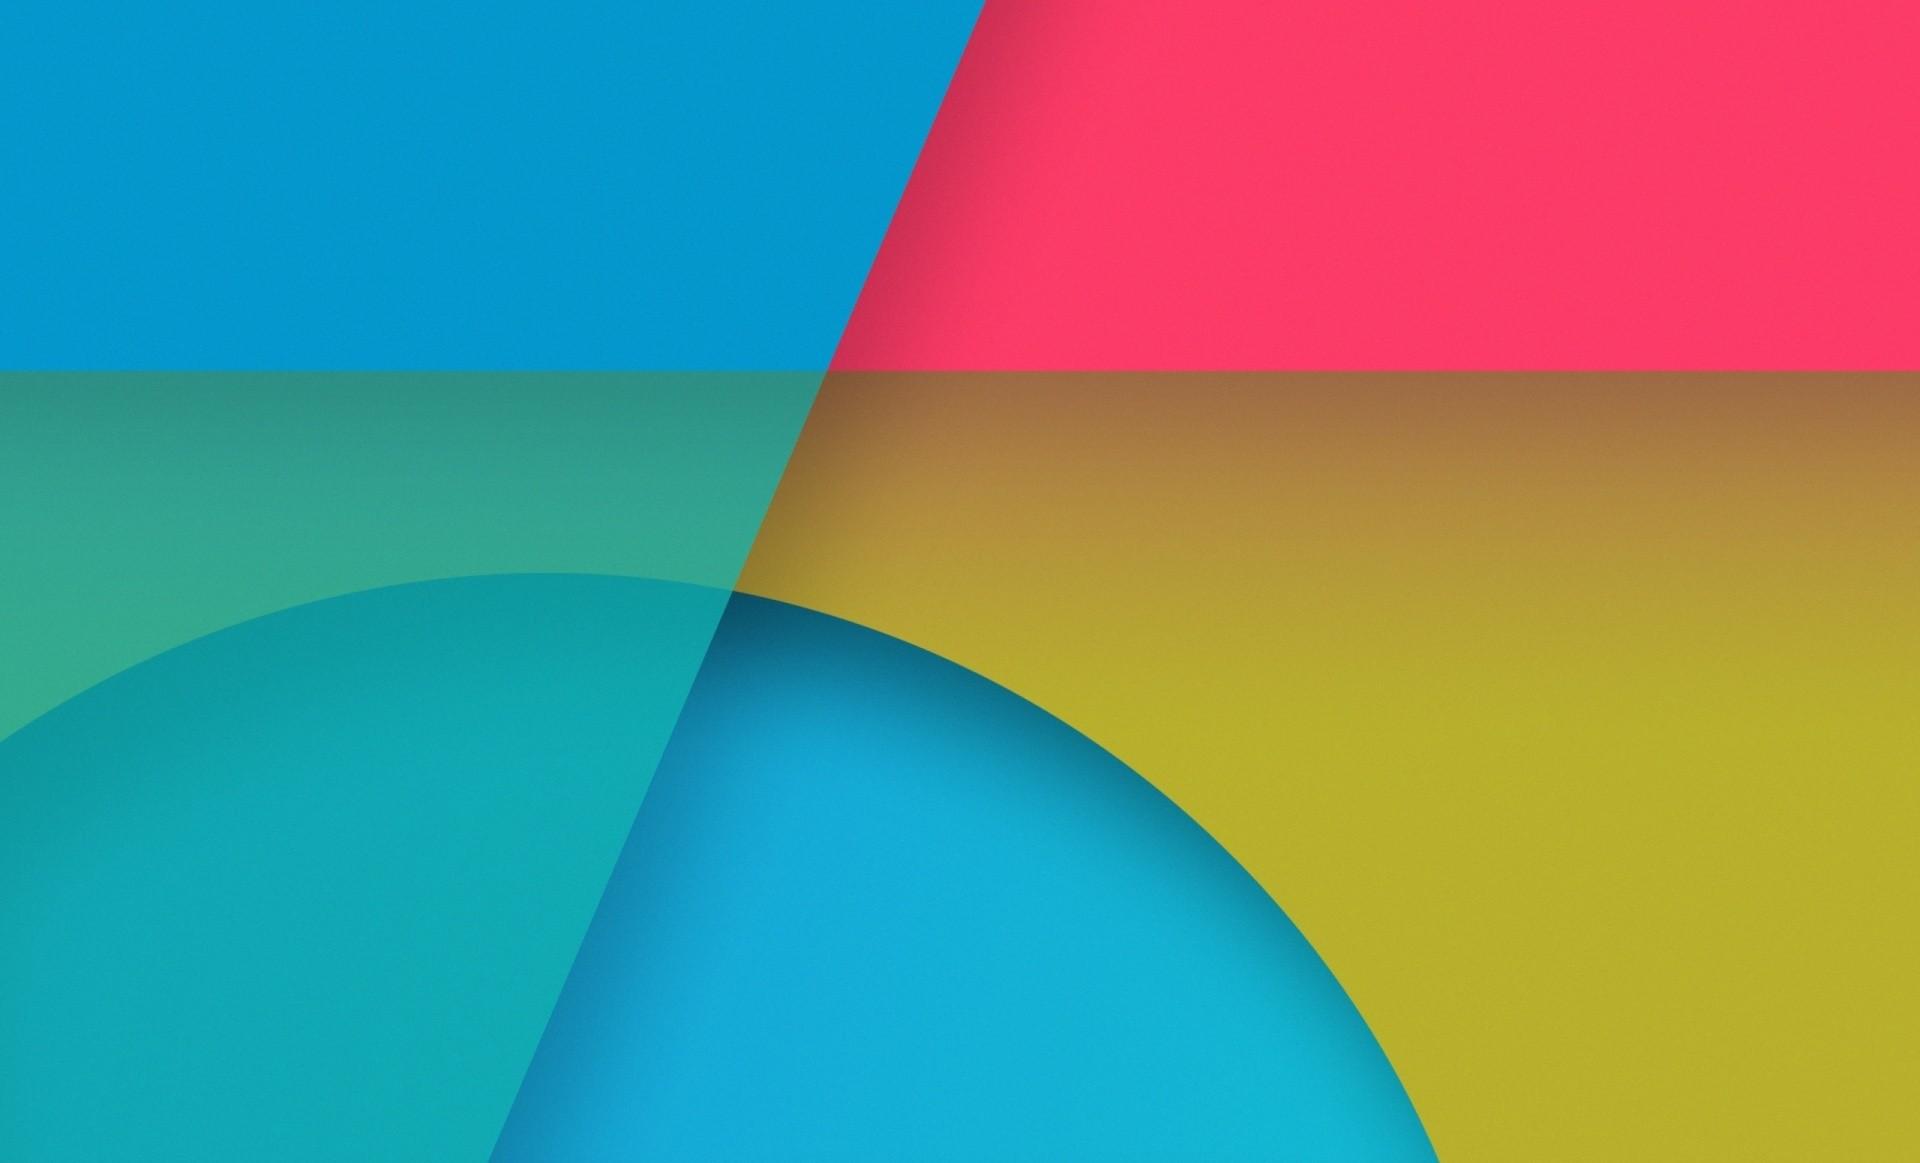 Nexus Five Wallpapers Desktop Wallpapers HD High Definition 1920x1163